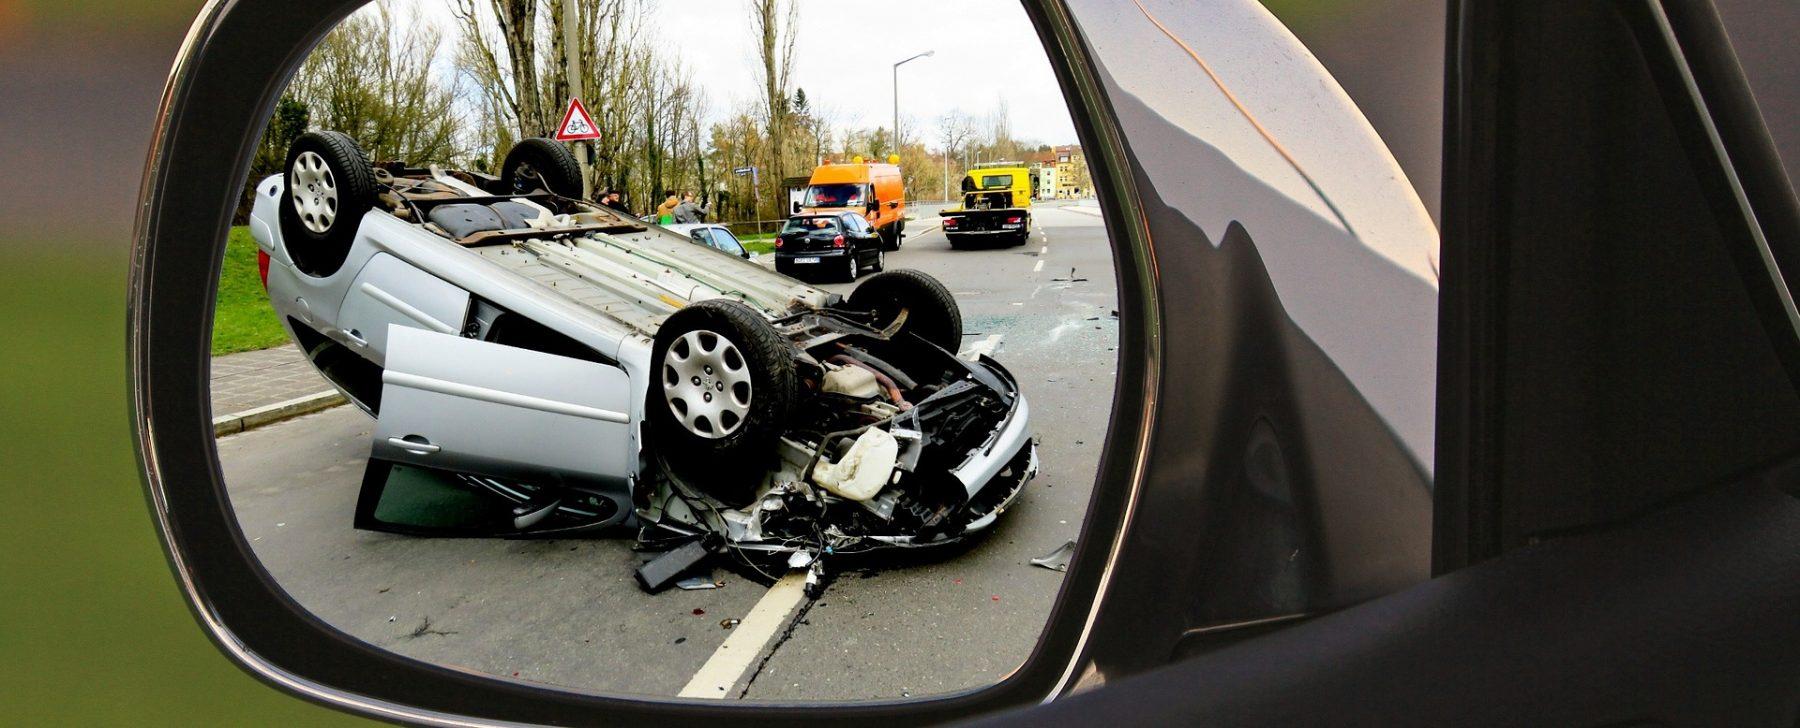 Accidentes de coche